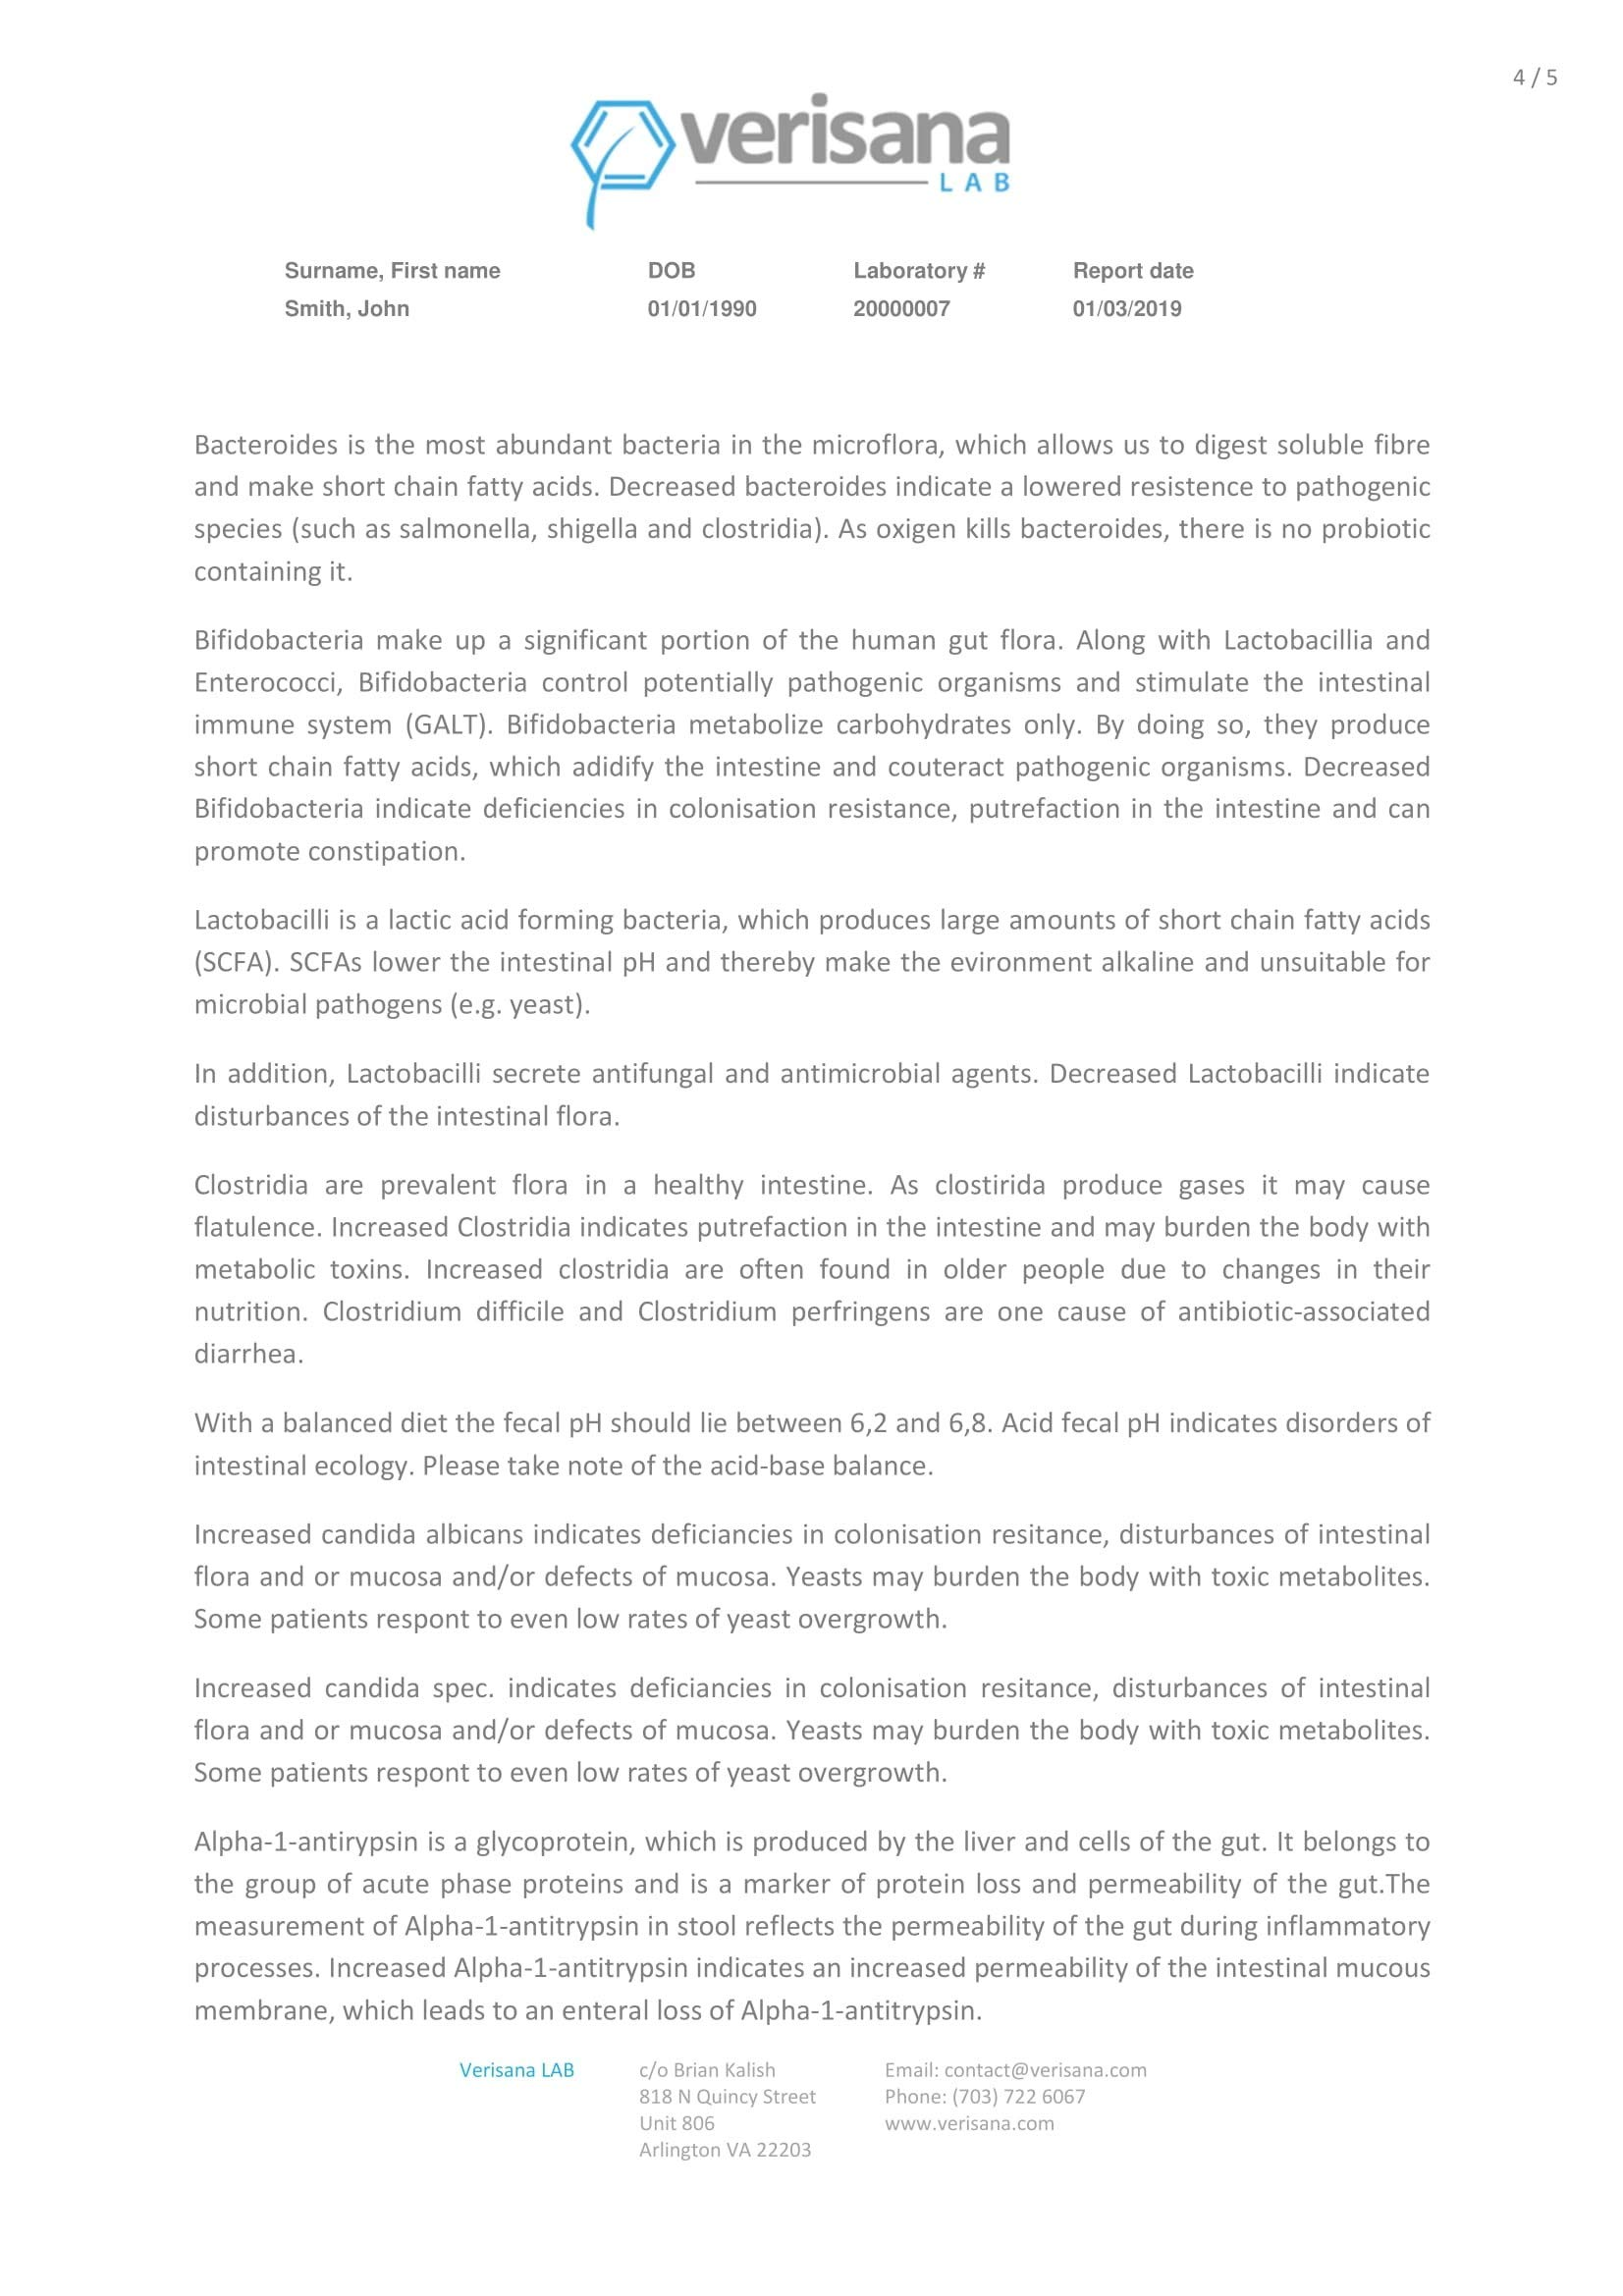 Leaky Gut Complete Stool Test – Determine Leaky Gut Syndrome, Candida & Gut Flora Imbalances – Measures Alpha-1-Antitrypsin, Secretory IGA & Zonulin by Verisana (Image #5)